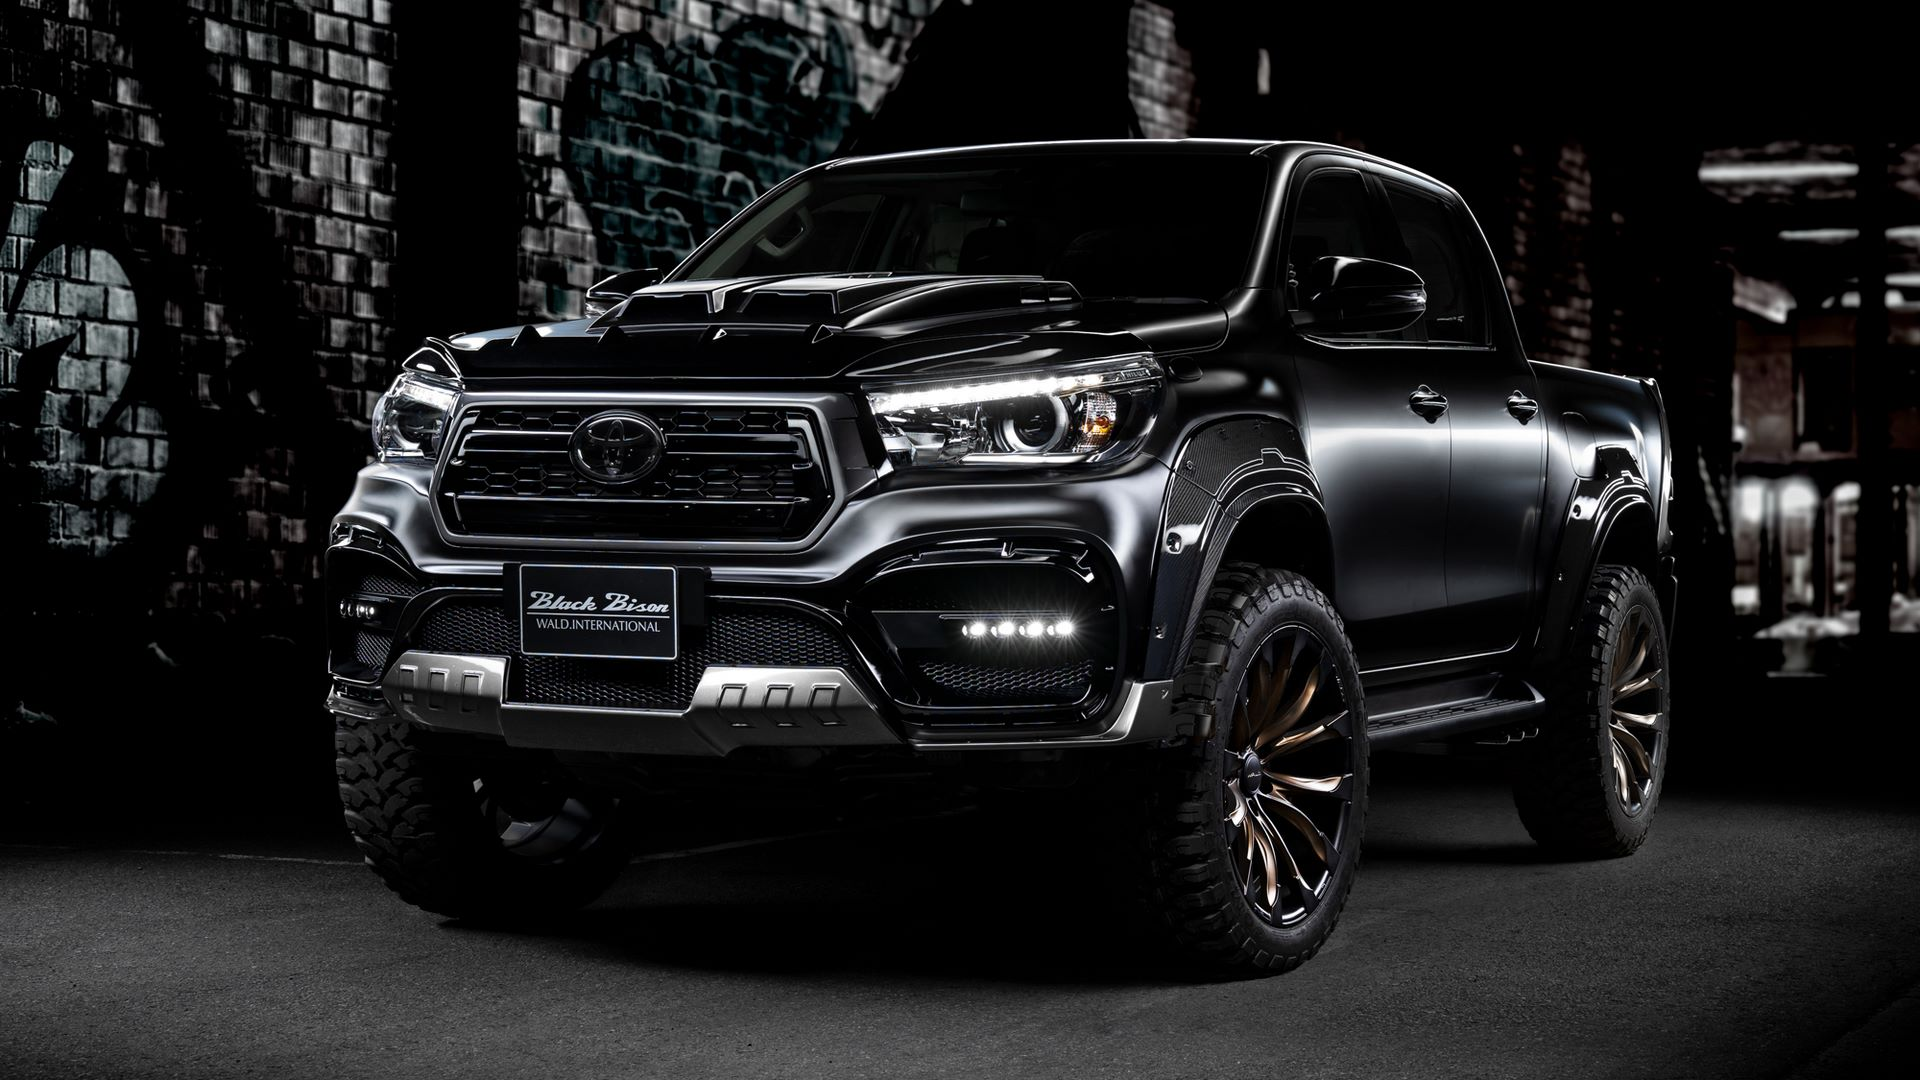 Toyota-Hilux-Black-Bison-by-Wald-International-1